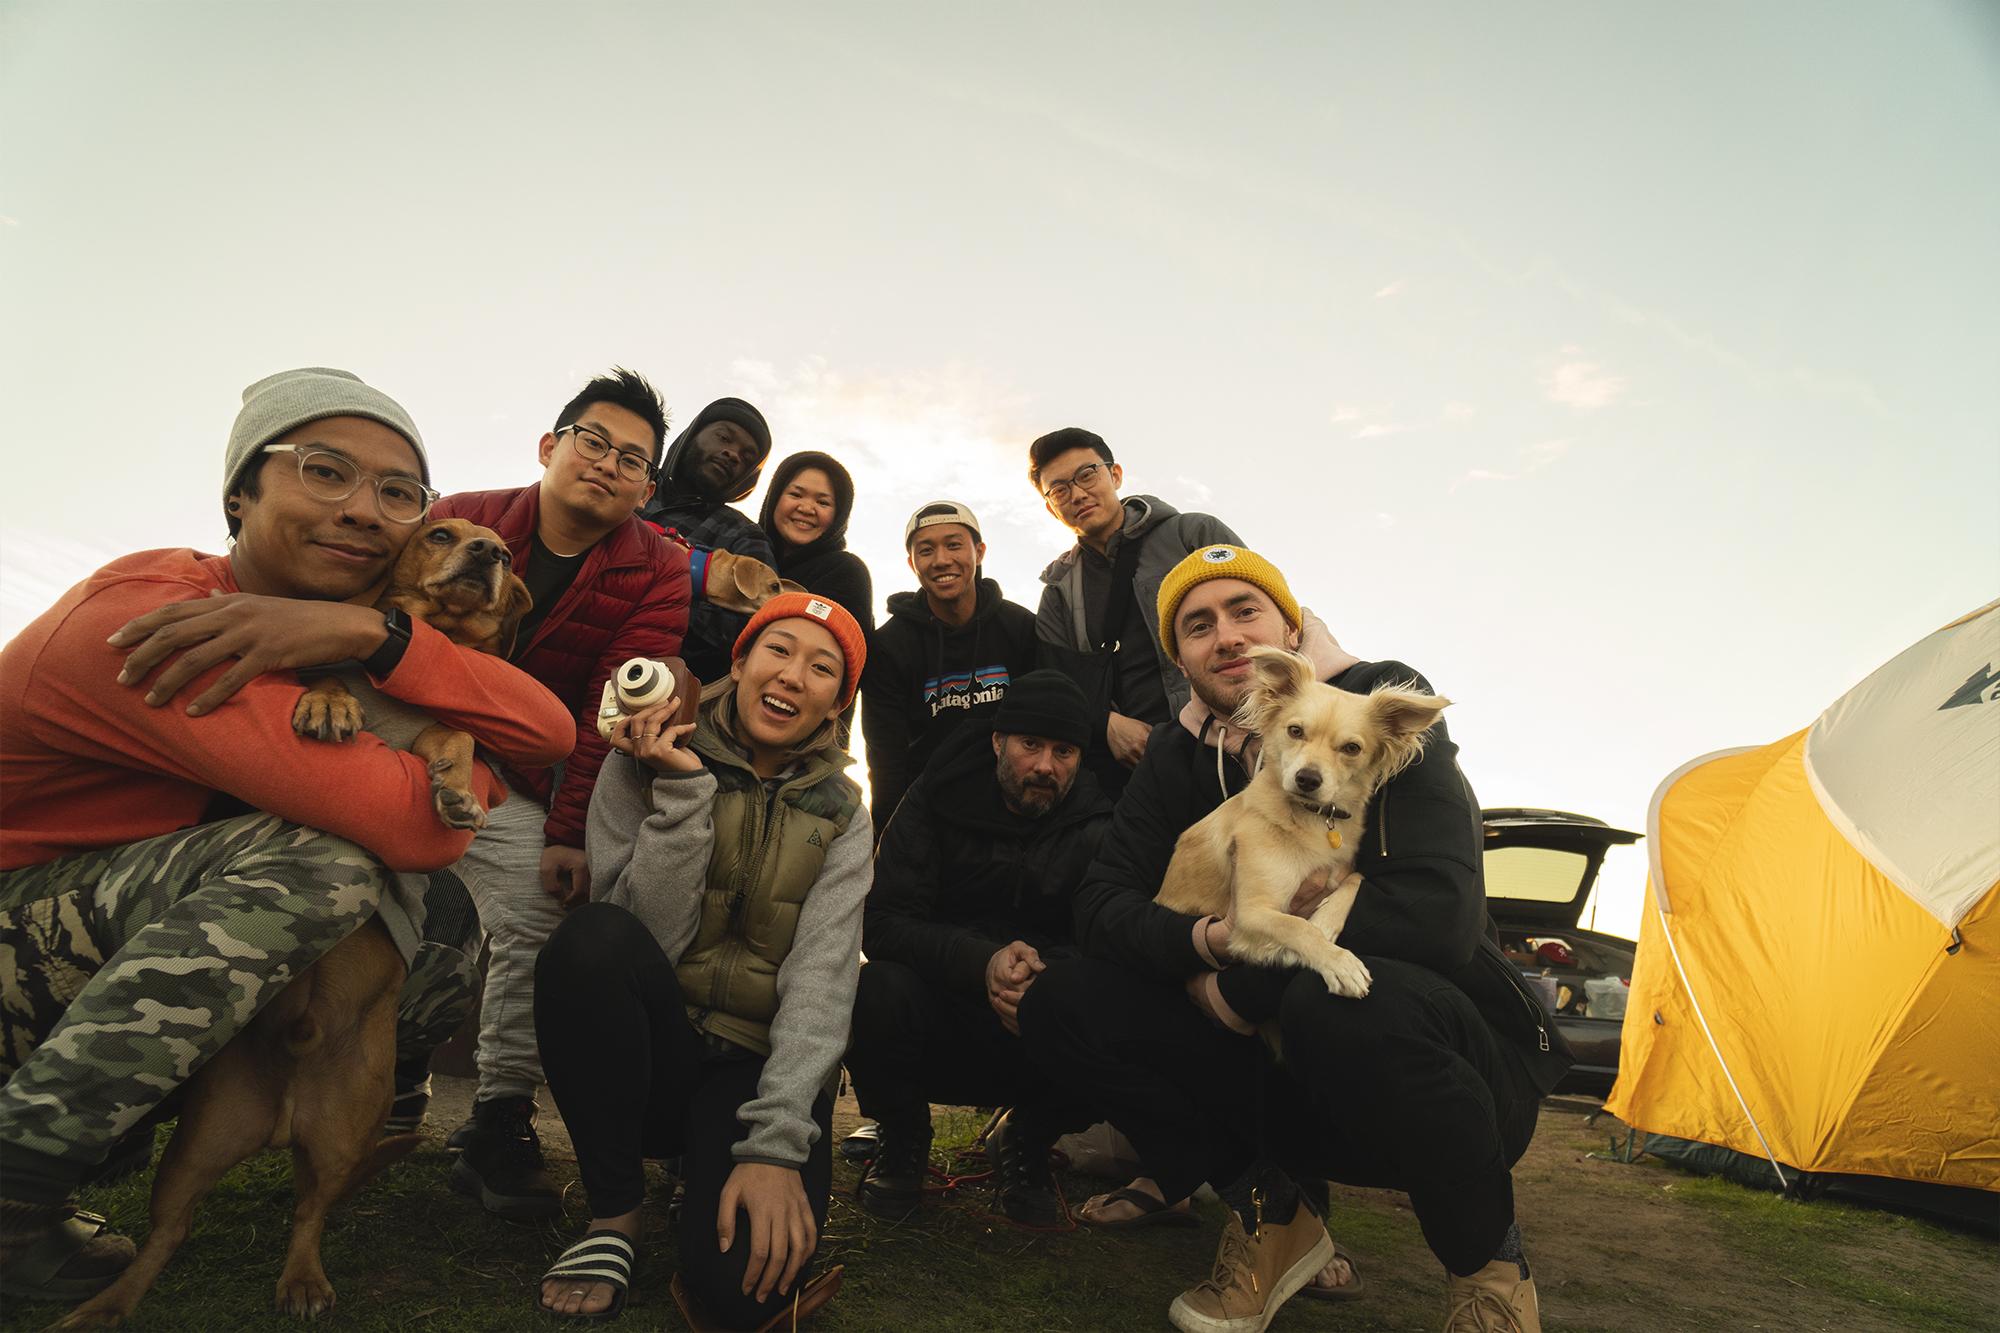 Hobo-Life-hoang-morro-bay-groupphoto-nye2.jpg